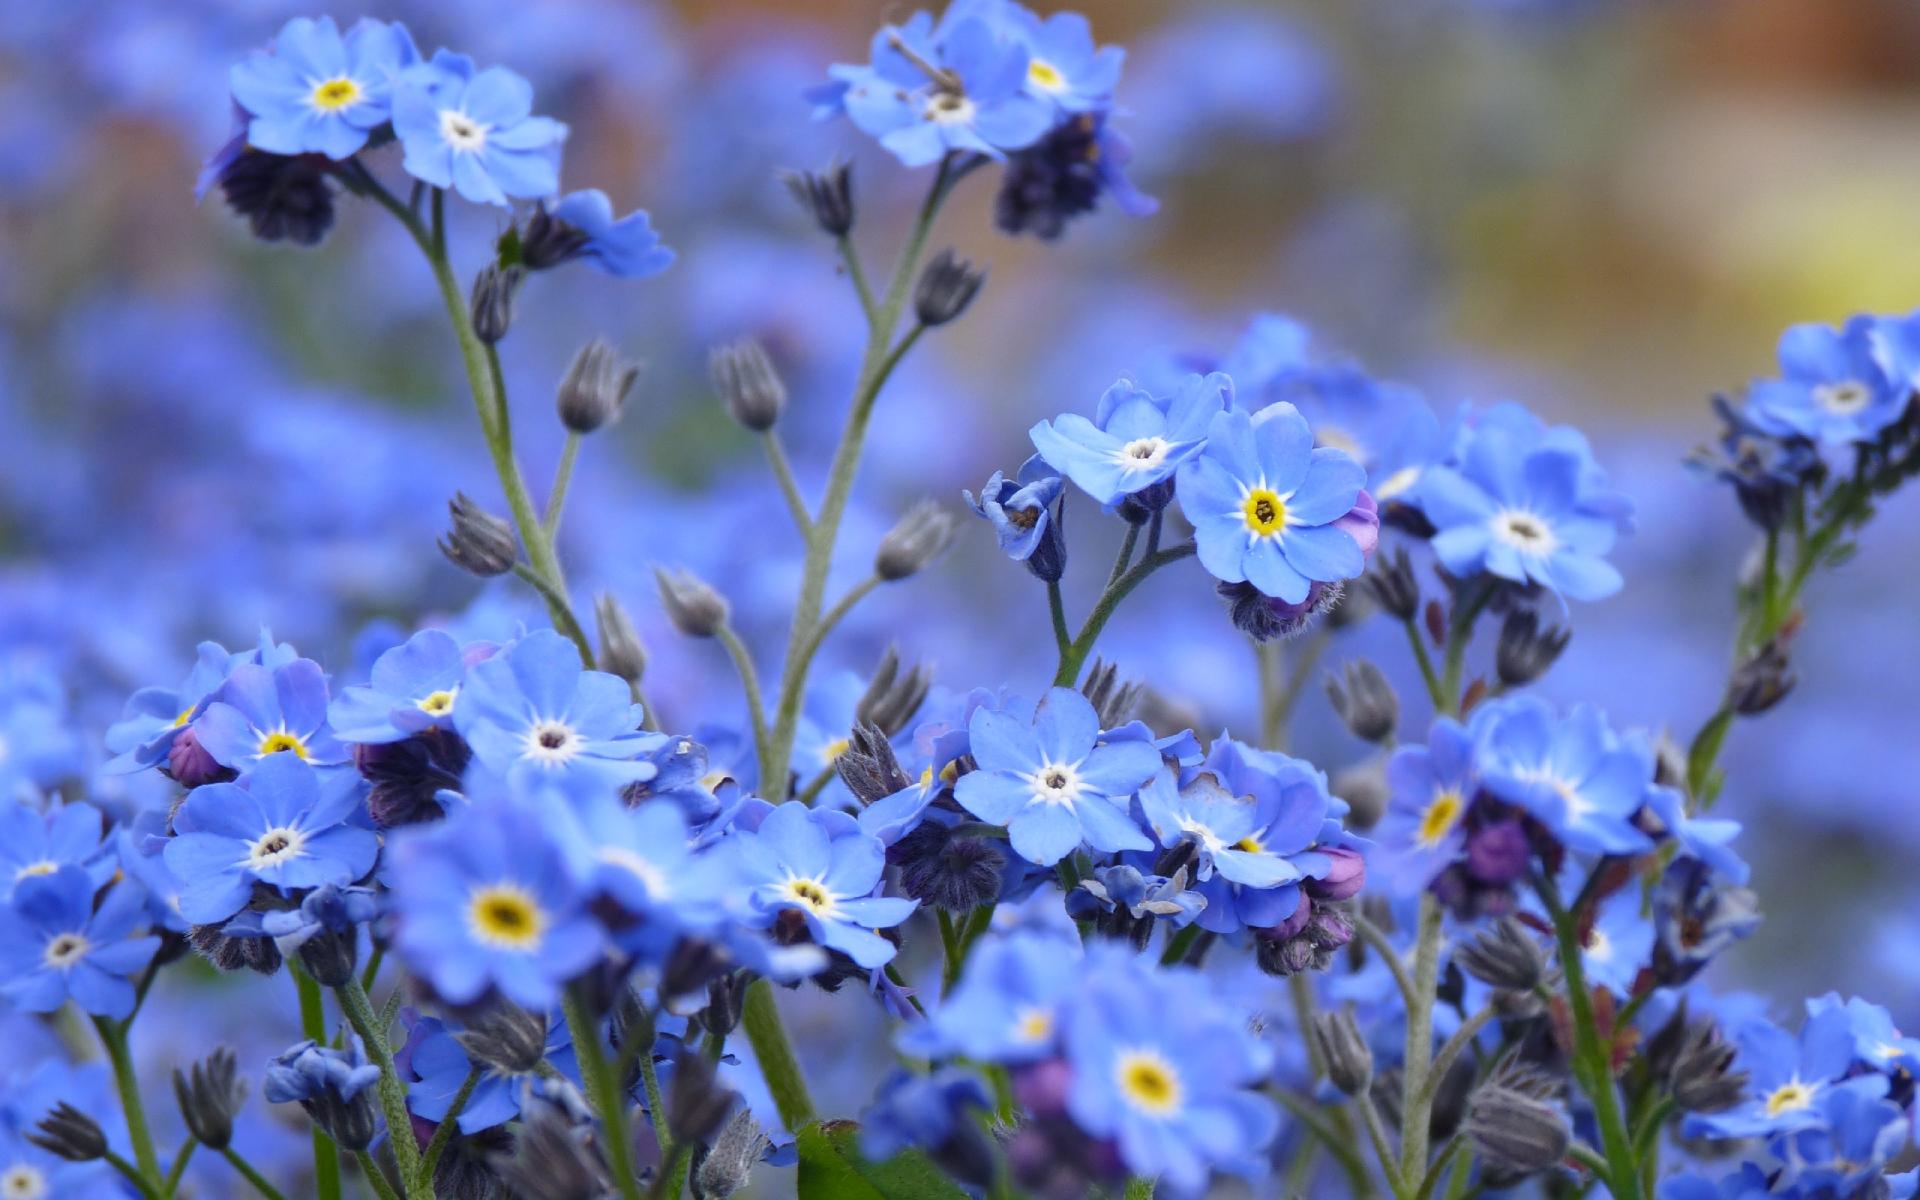 http://www.kartinki24.ru/uploads/gallery/main/36/kartinki24_flowers_0194.jpg